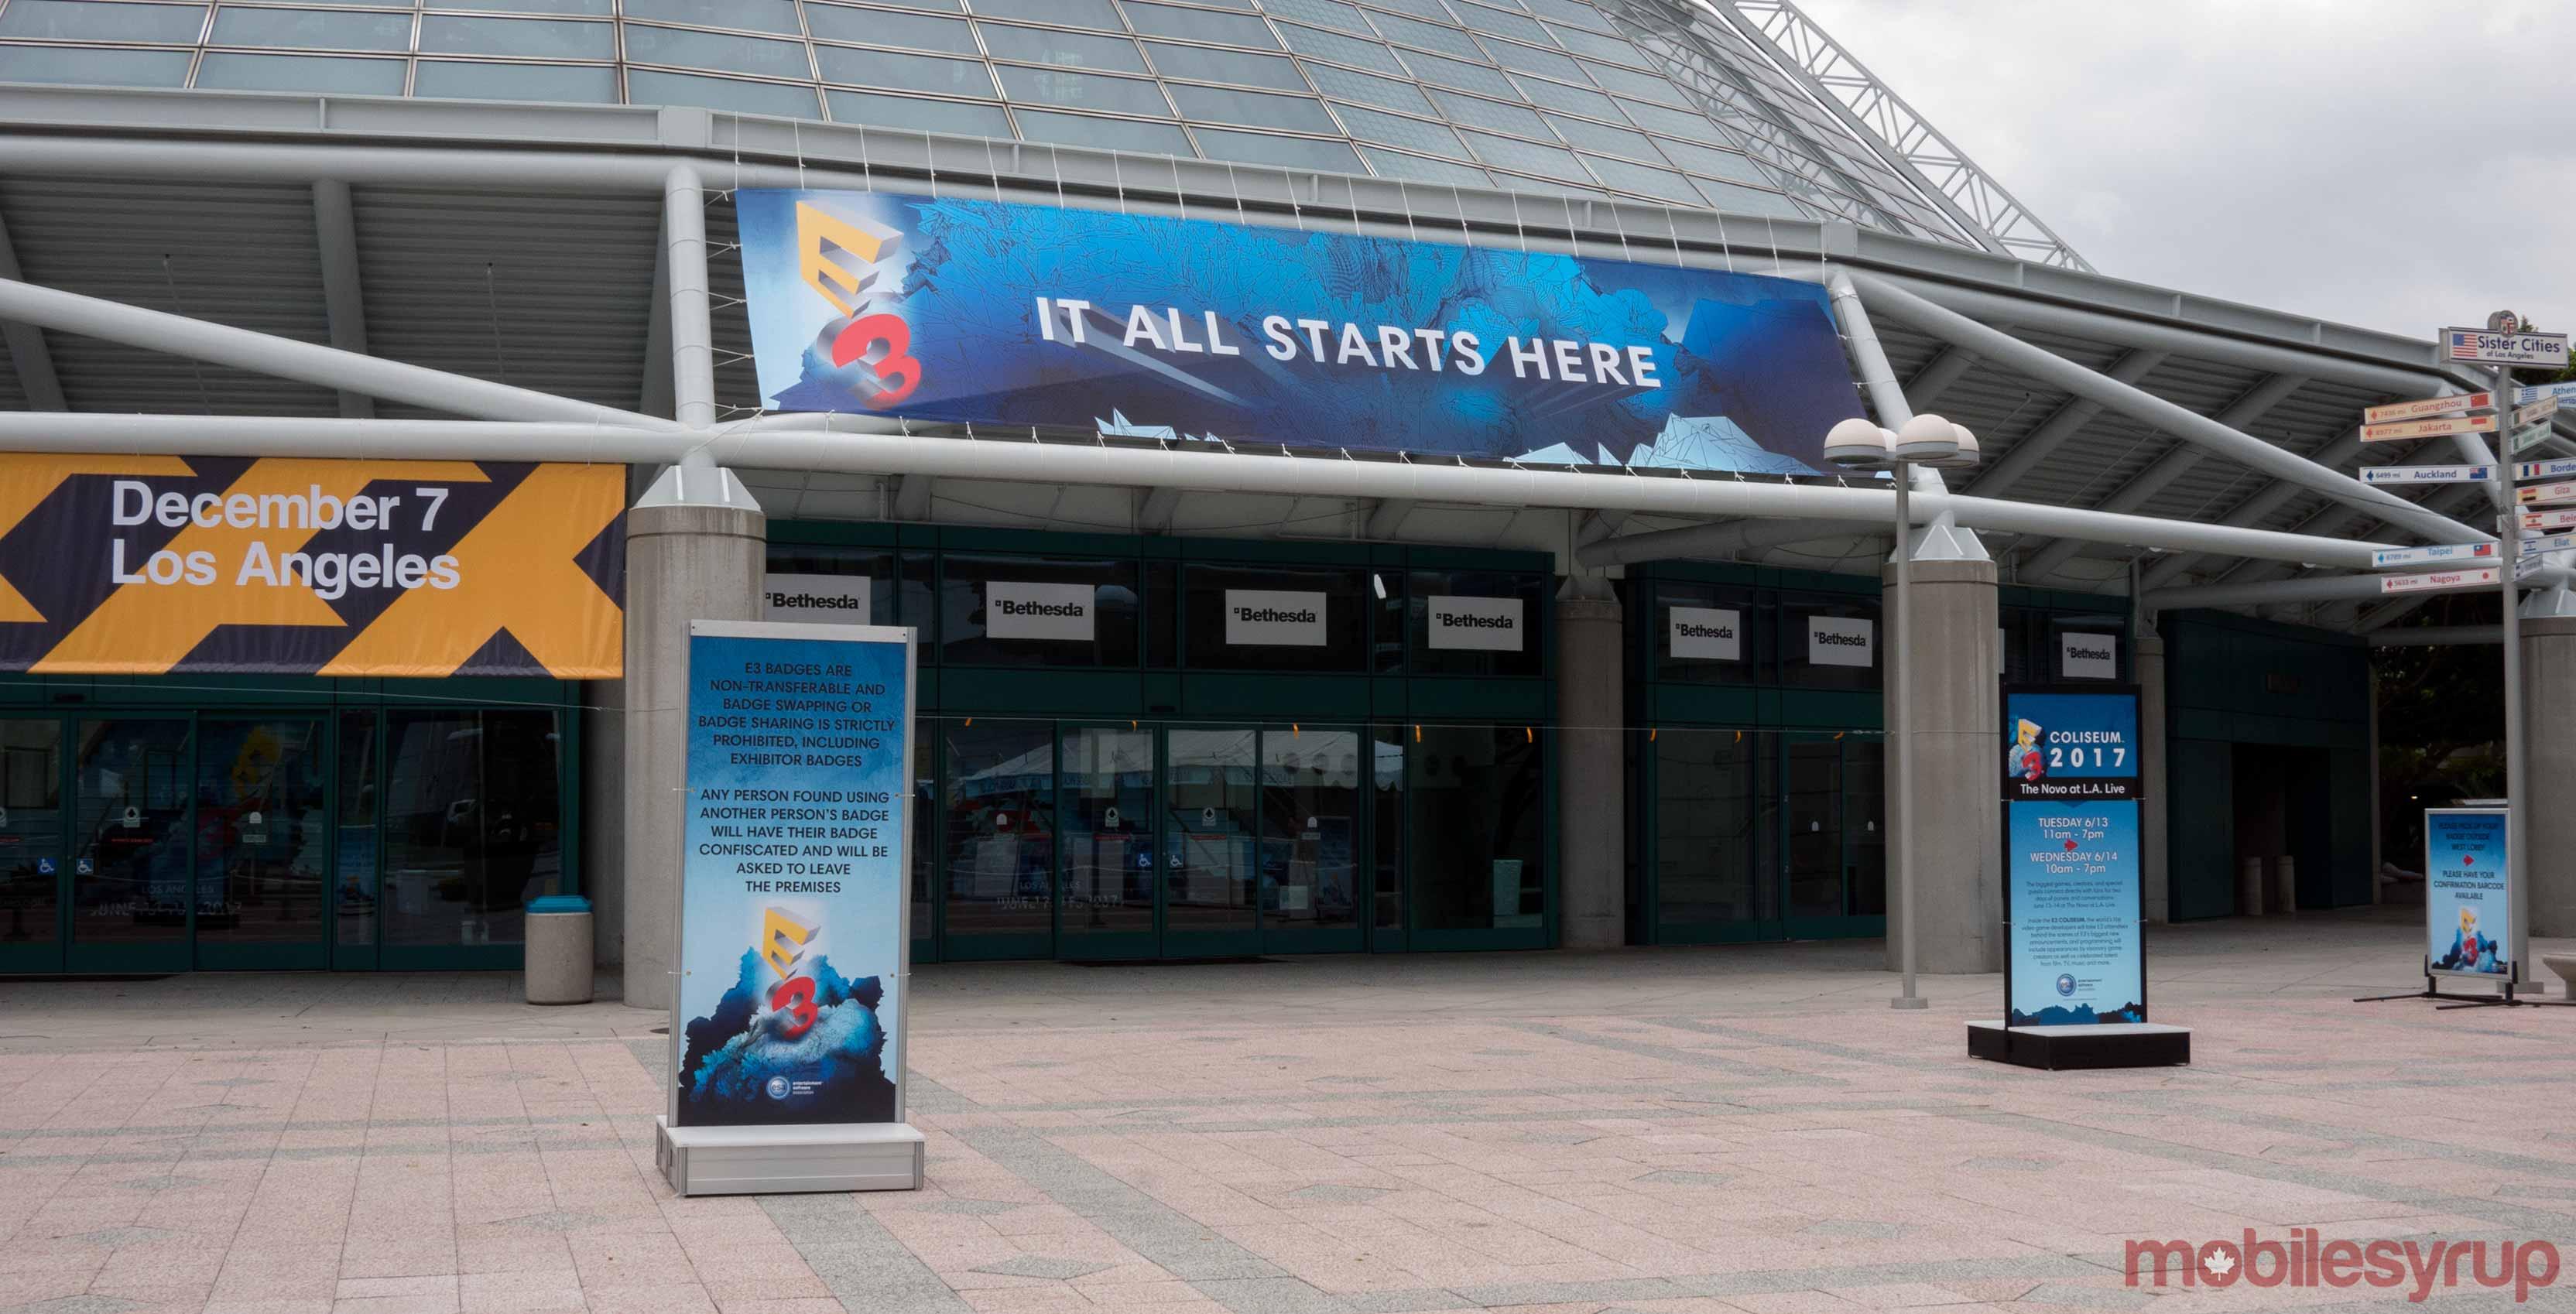 E3 2017 entrance